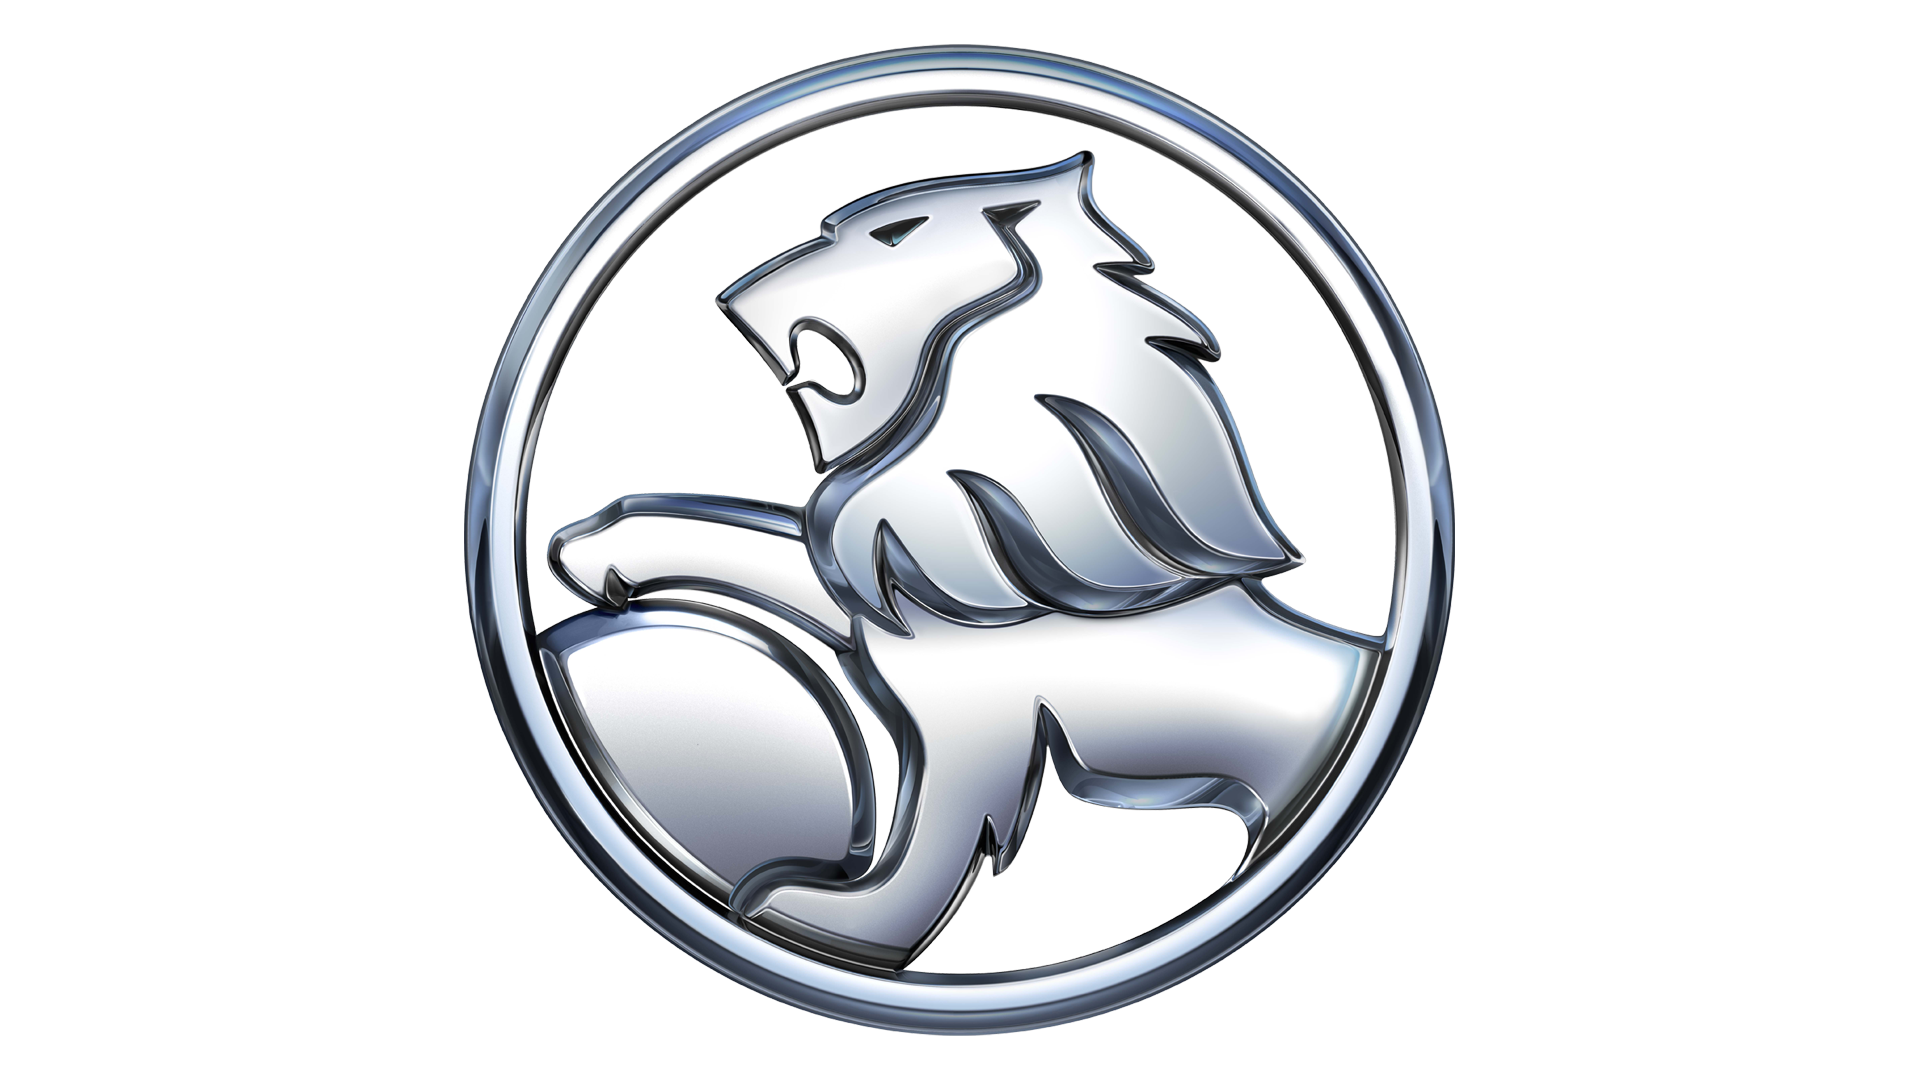 Holden-logo-2016-1920x1080.png